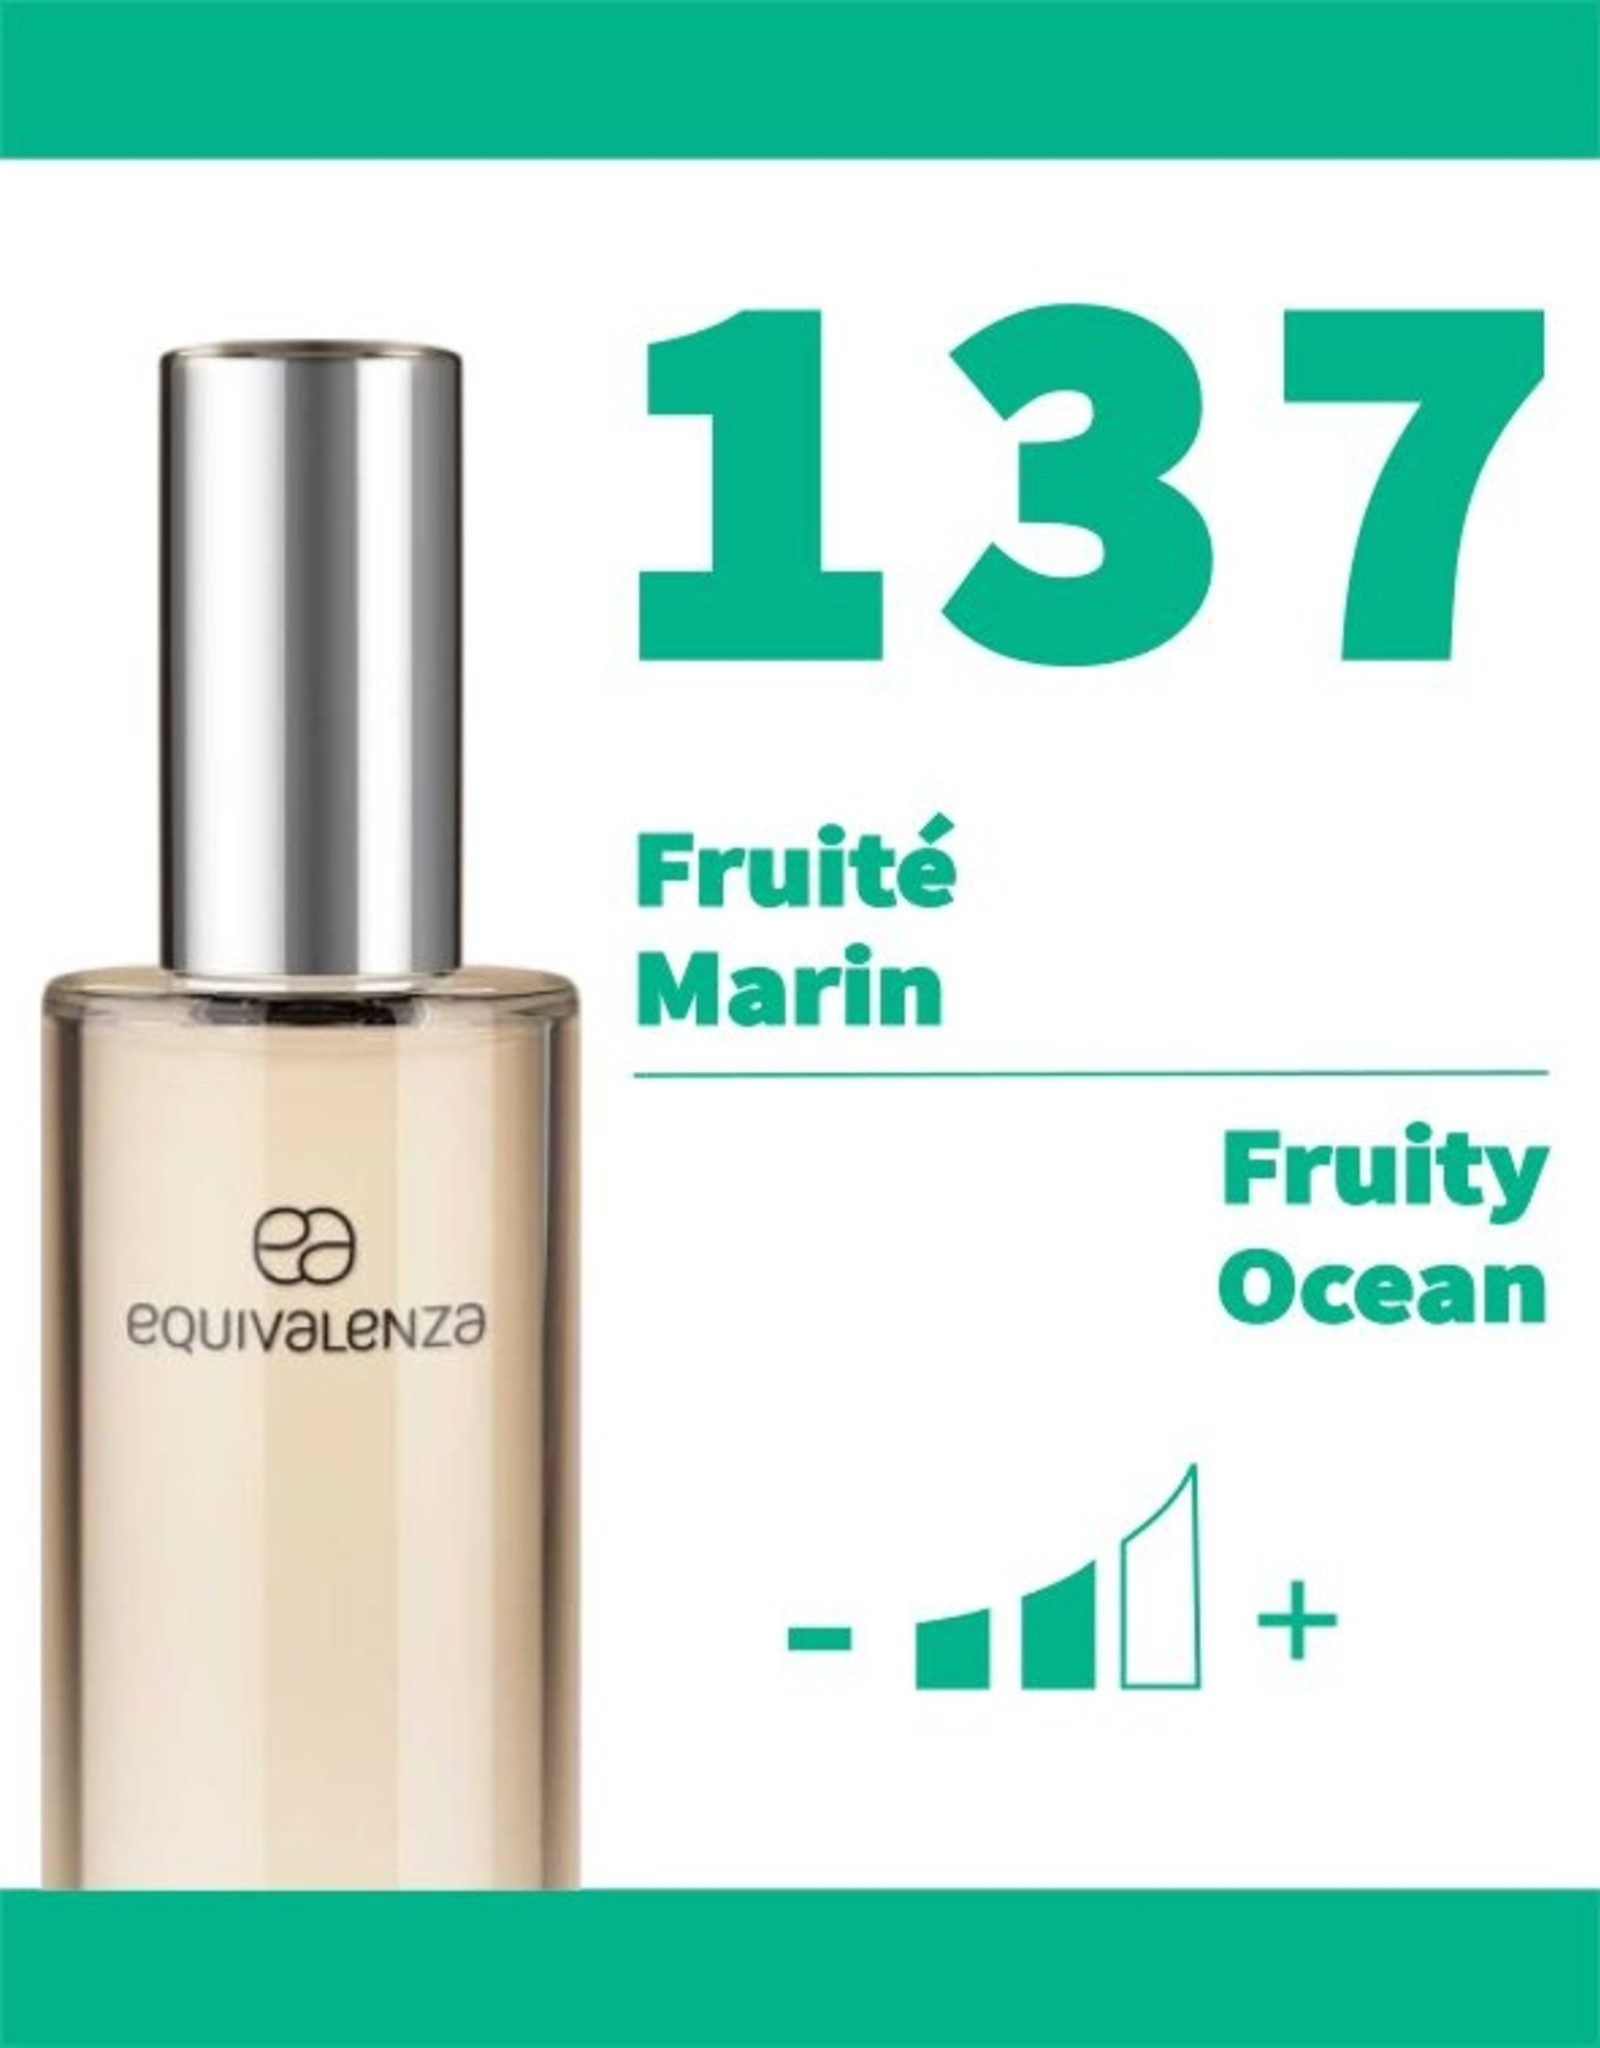 Equivalenza Fruity Ocean 137